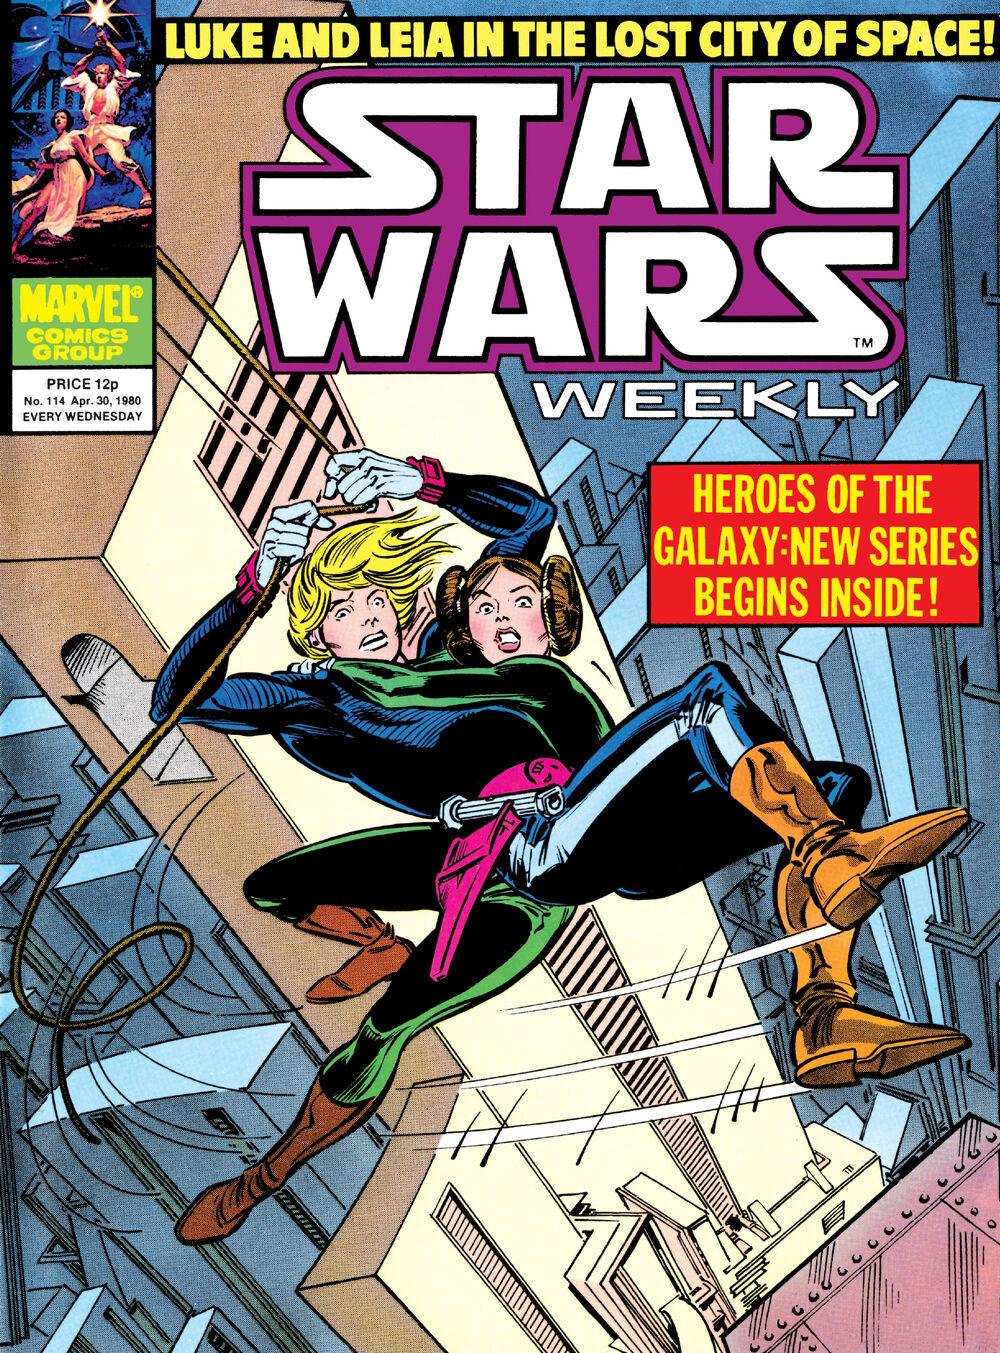 Star Wars Weekly 114